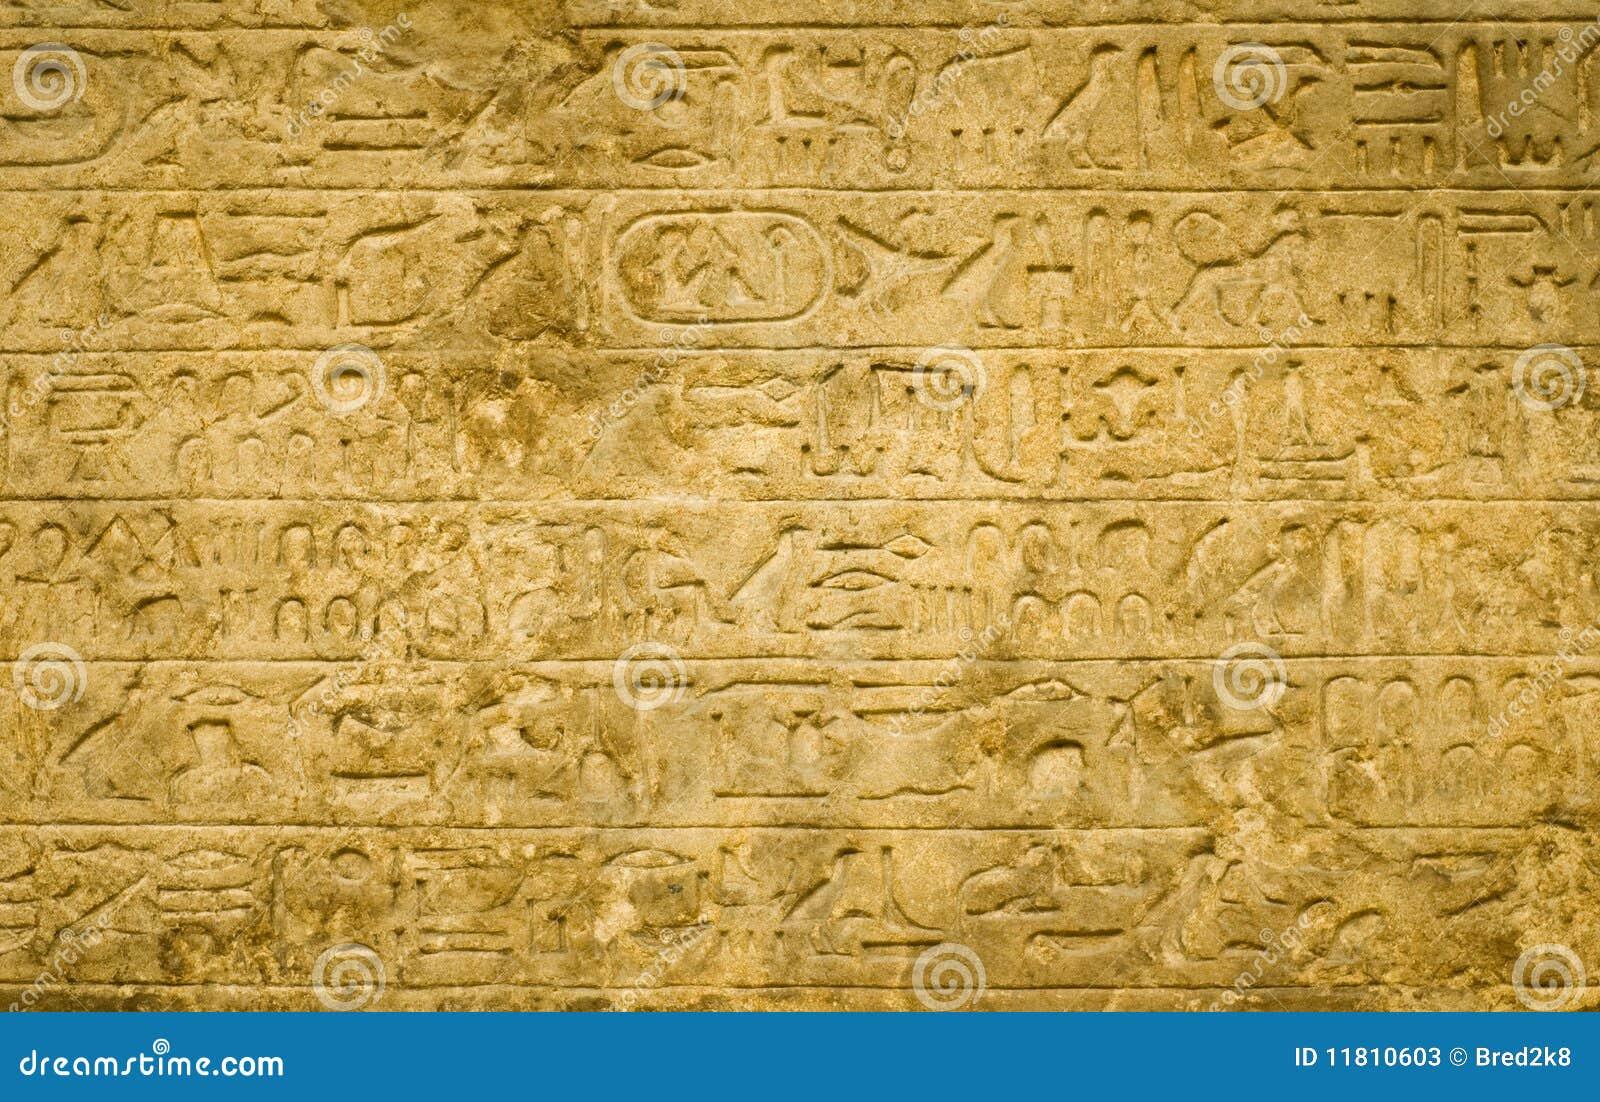 simple egyptian hieroglyphics wallpaper - photo #21